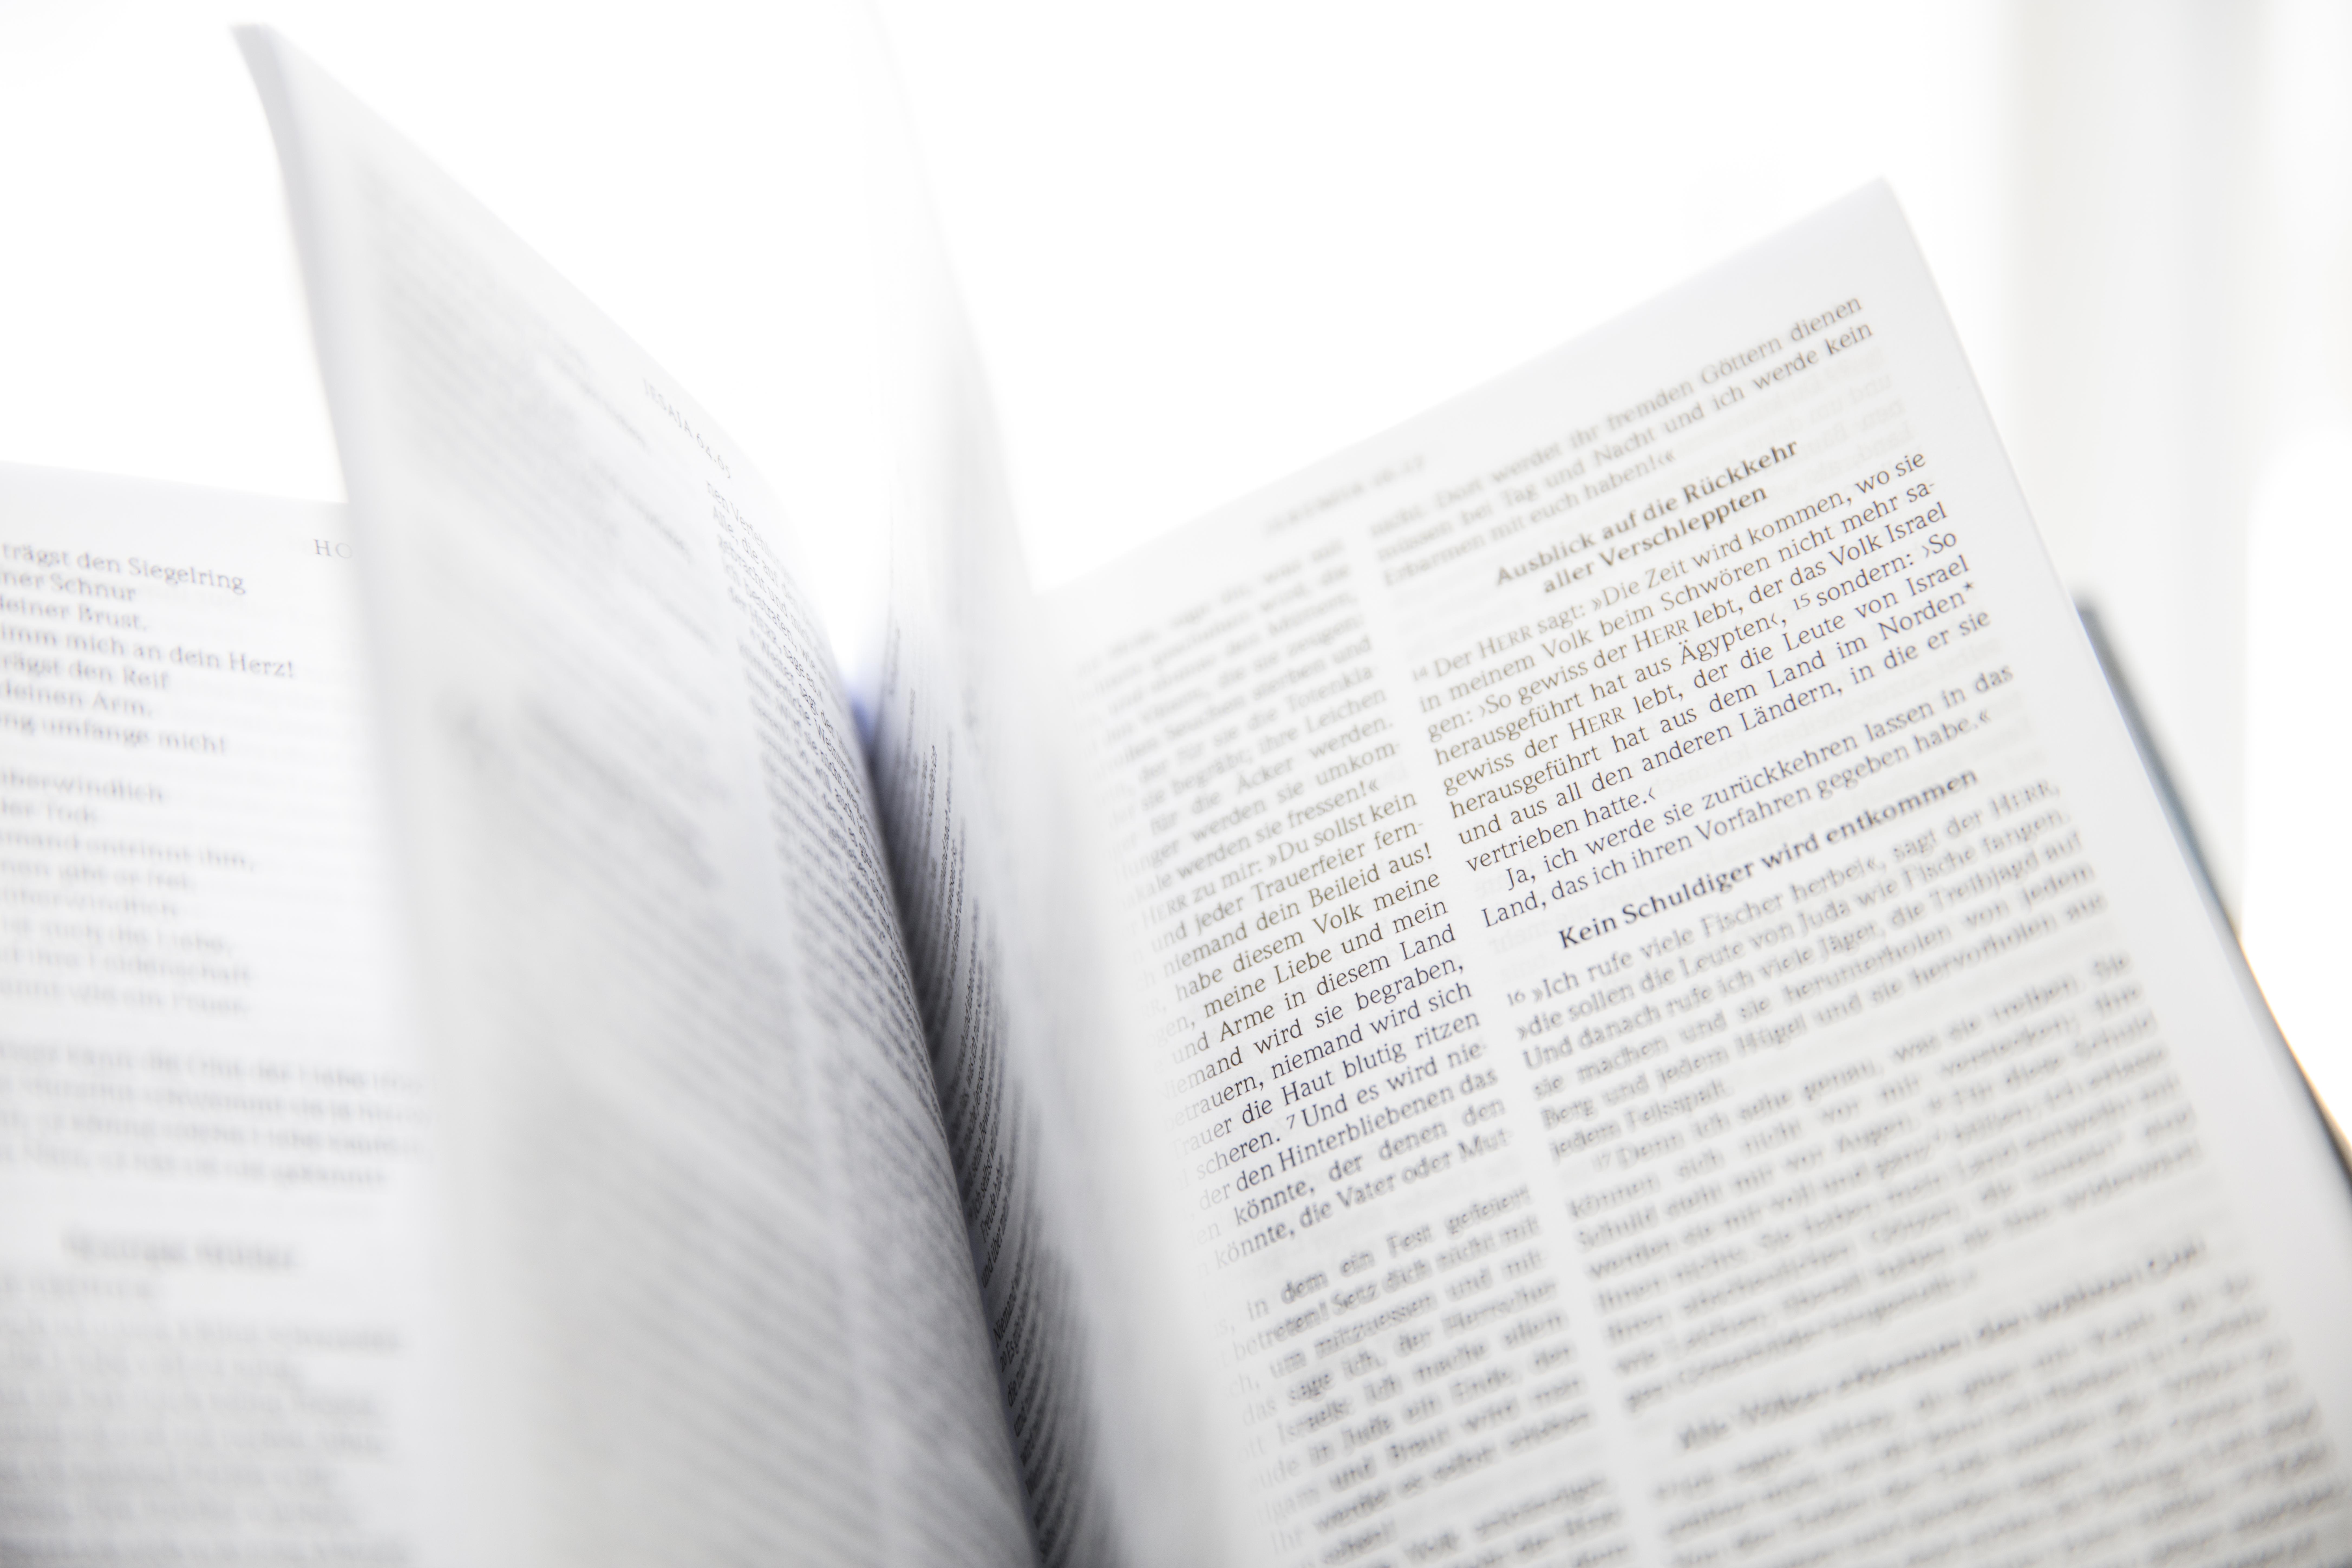 Focus Photo of Open Book